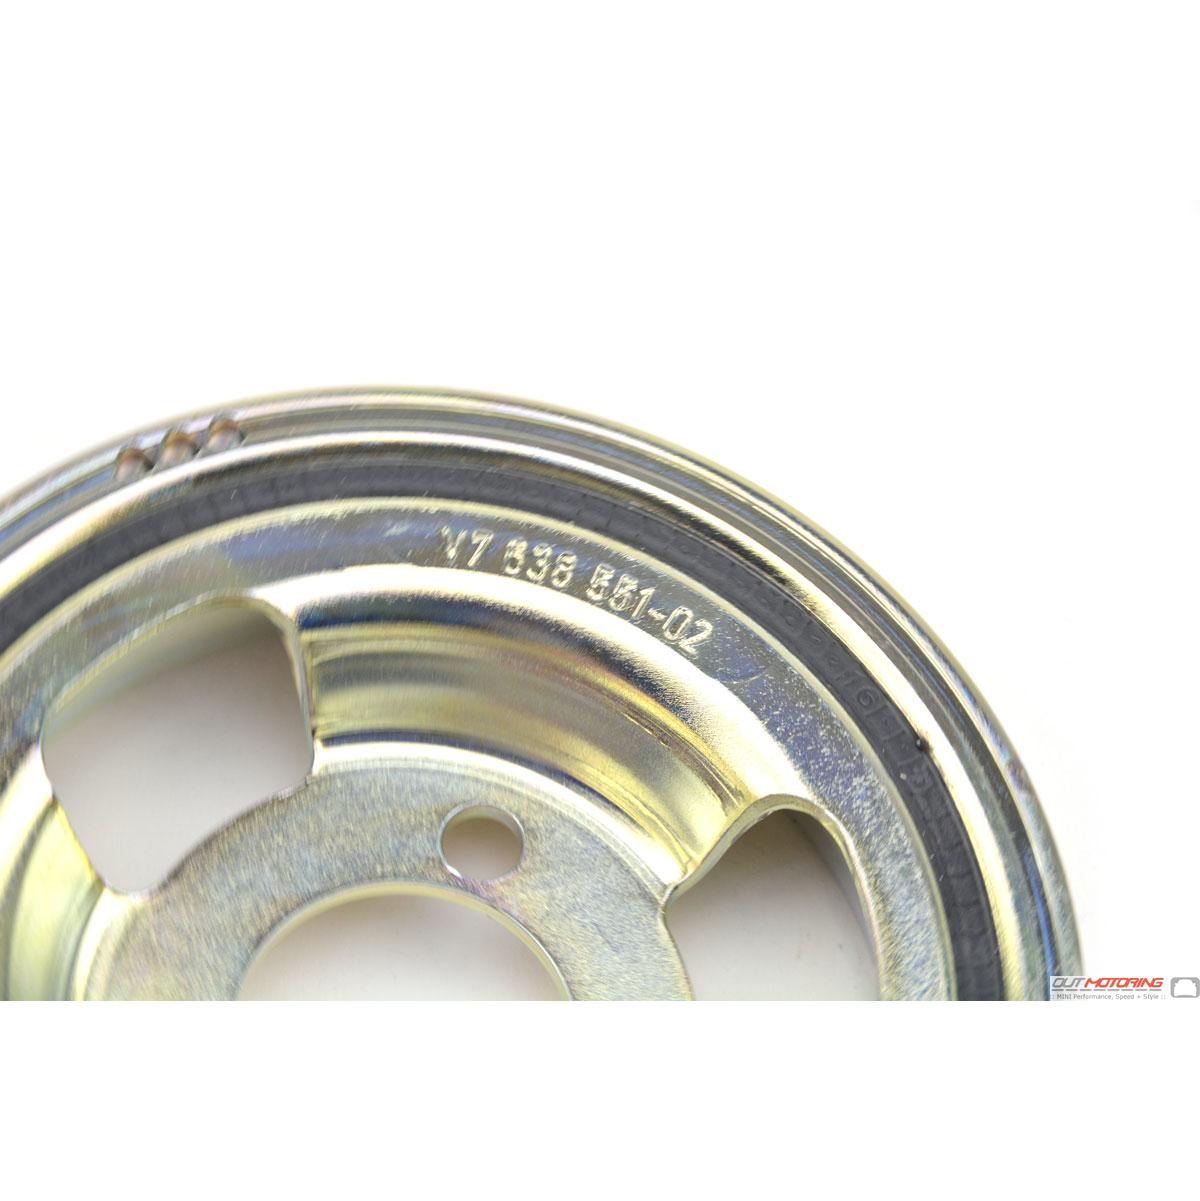 11237638551 Dampened MINI Cooper Crank Pulley